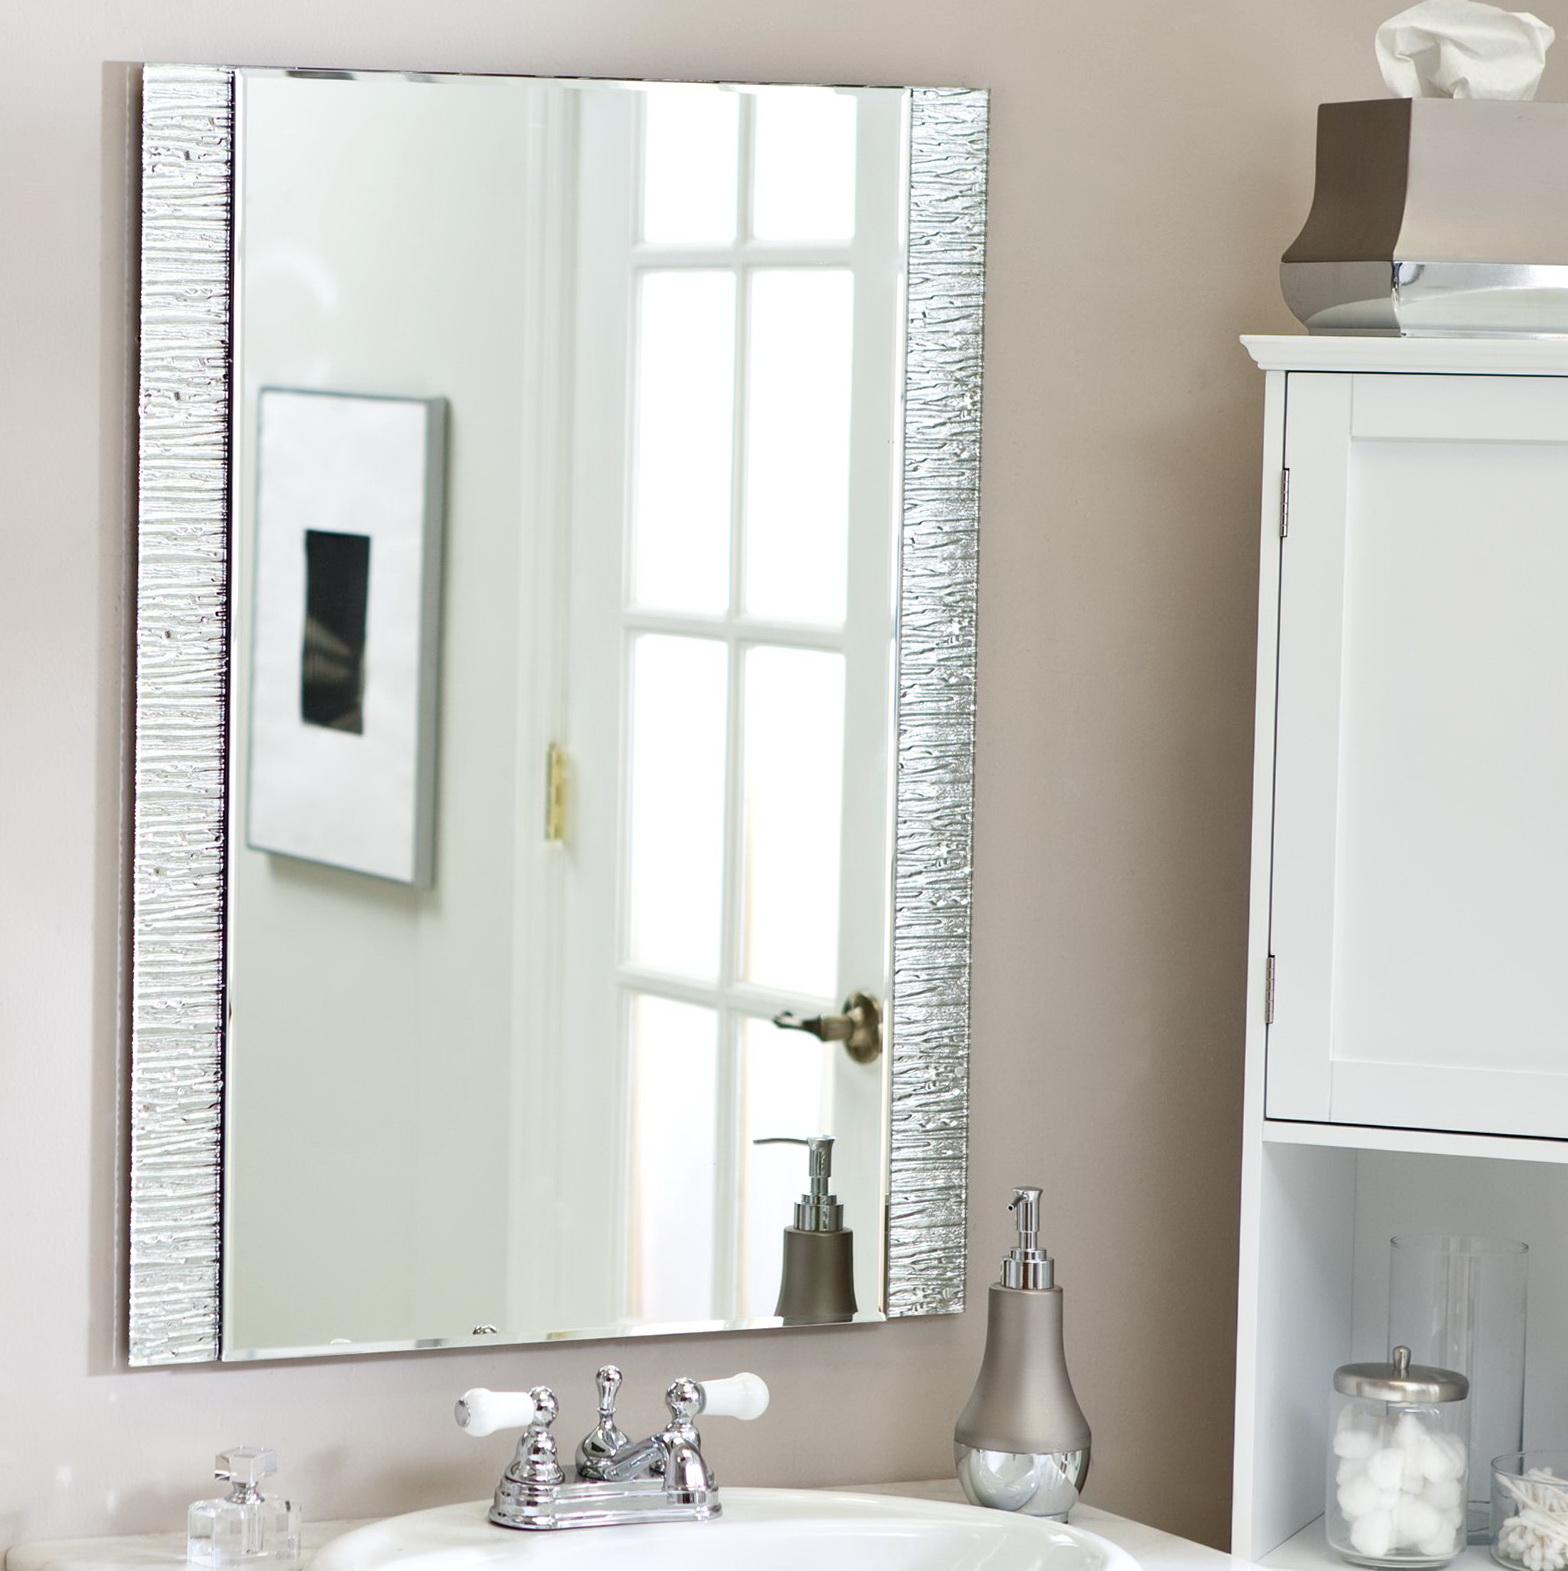 Bathroom Mirror Ideas Photos